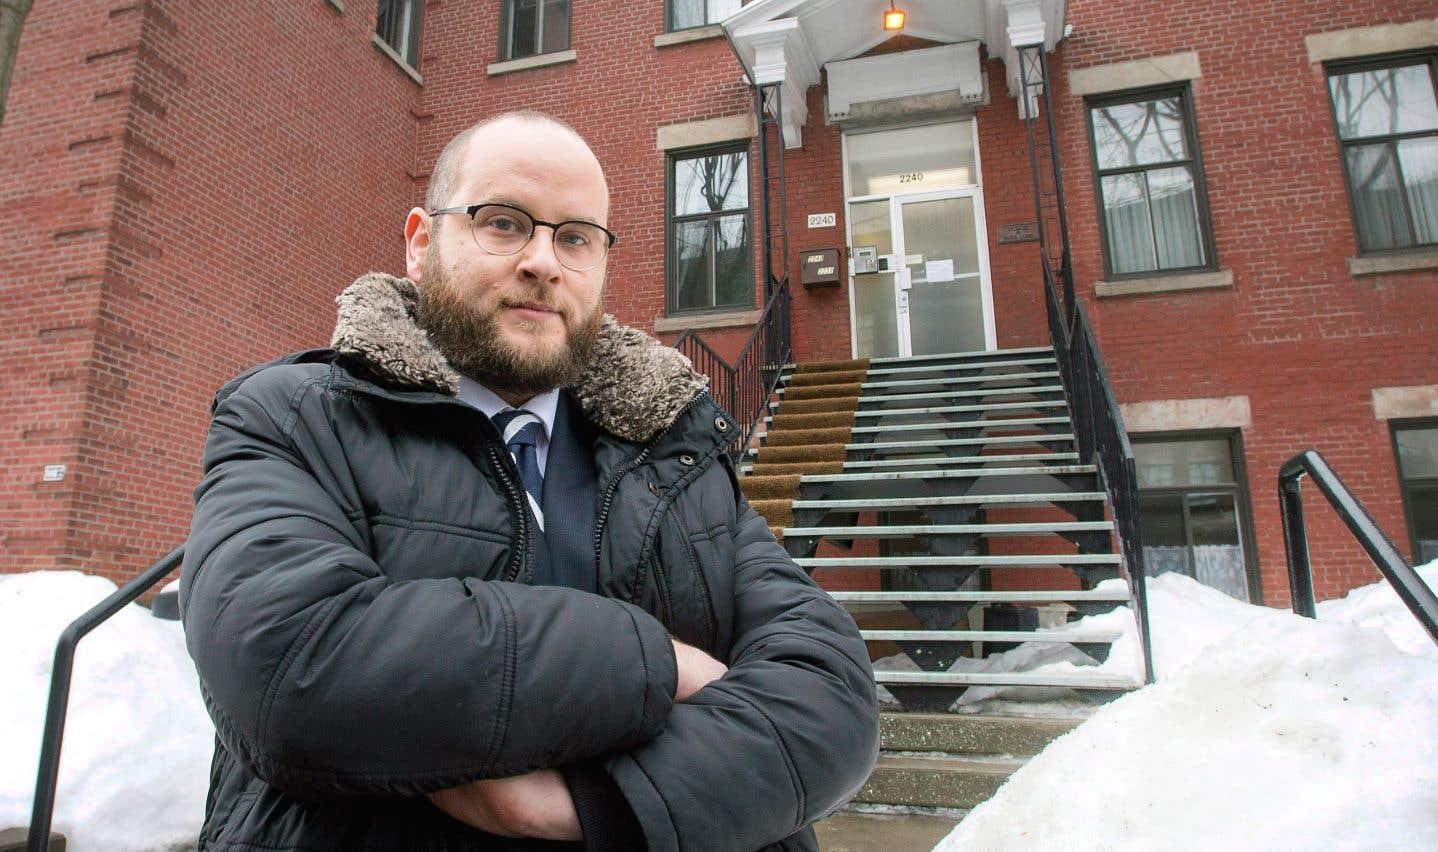 L'avocat du plaignant, Max Silverman